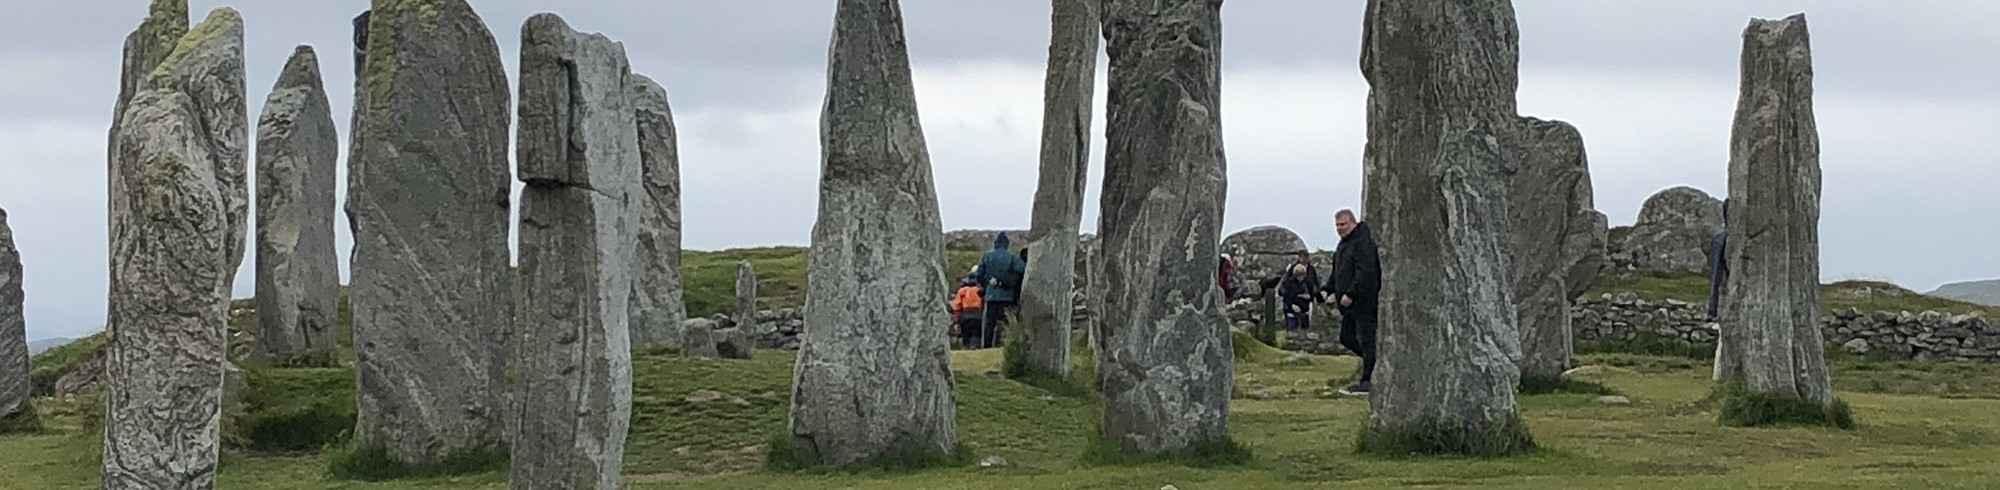 Callanish Stones, Stornoway, Isle of Lewis